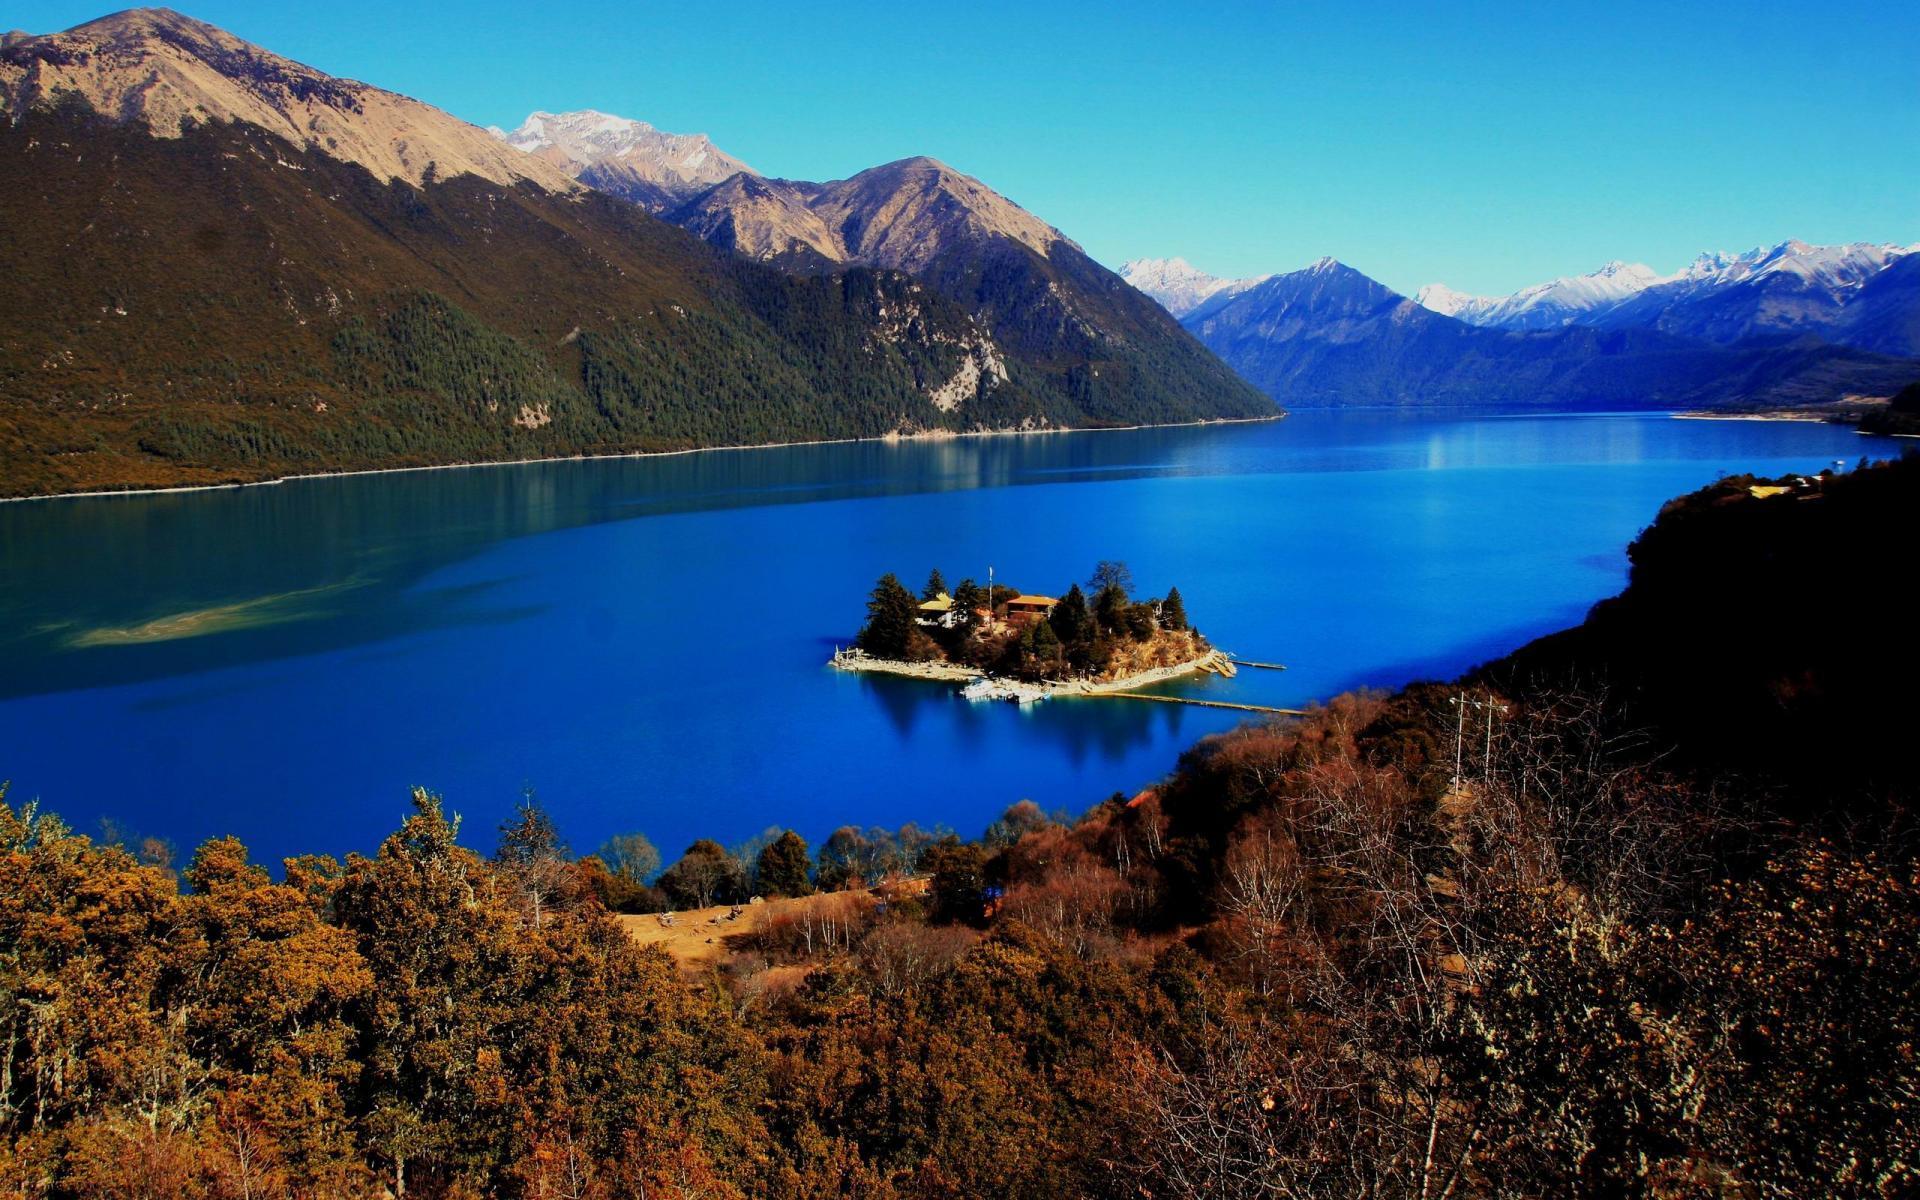 http://4.bp.blogspot.com/-6F62X_bQ6mY/UEddLOBO8FI/AAAAAAAAE3g/ja42A7OhqiY/s1920/china-Tibet-travel-1200.jpg